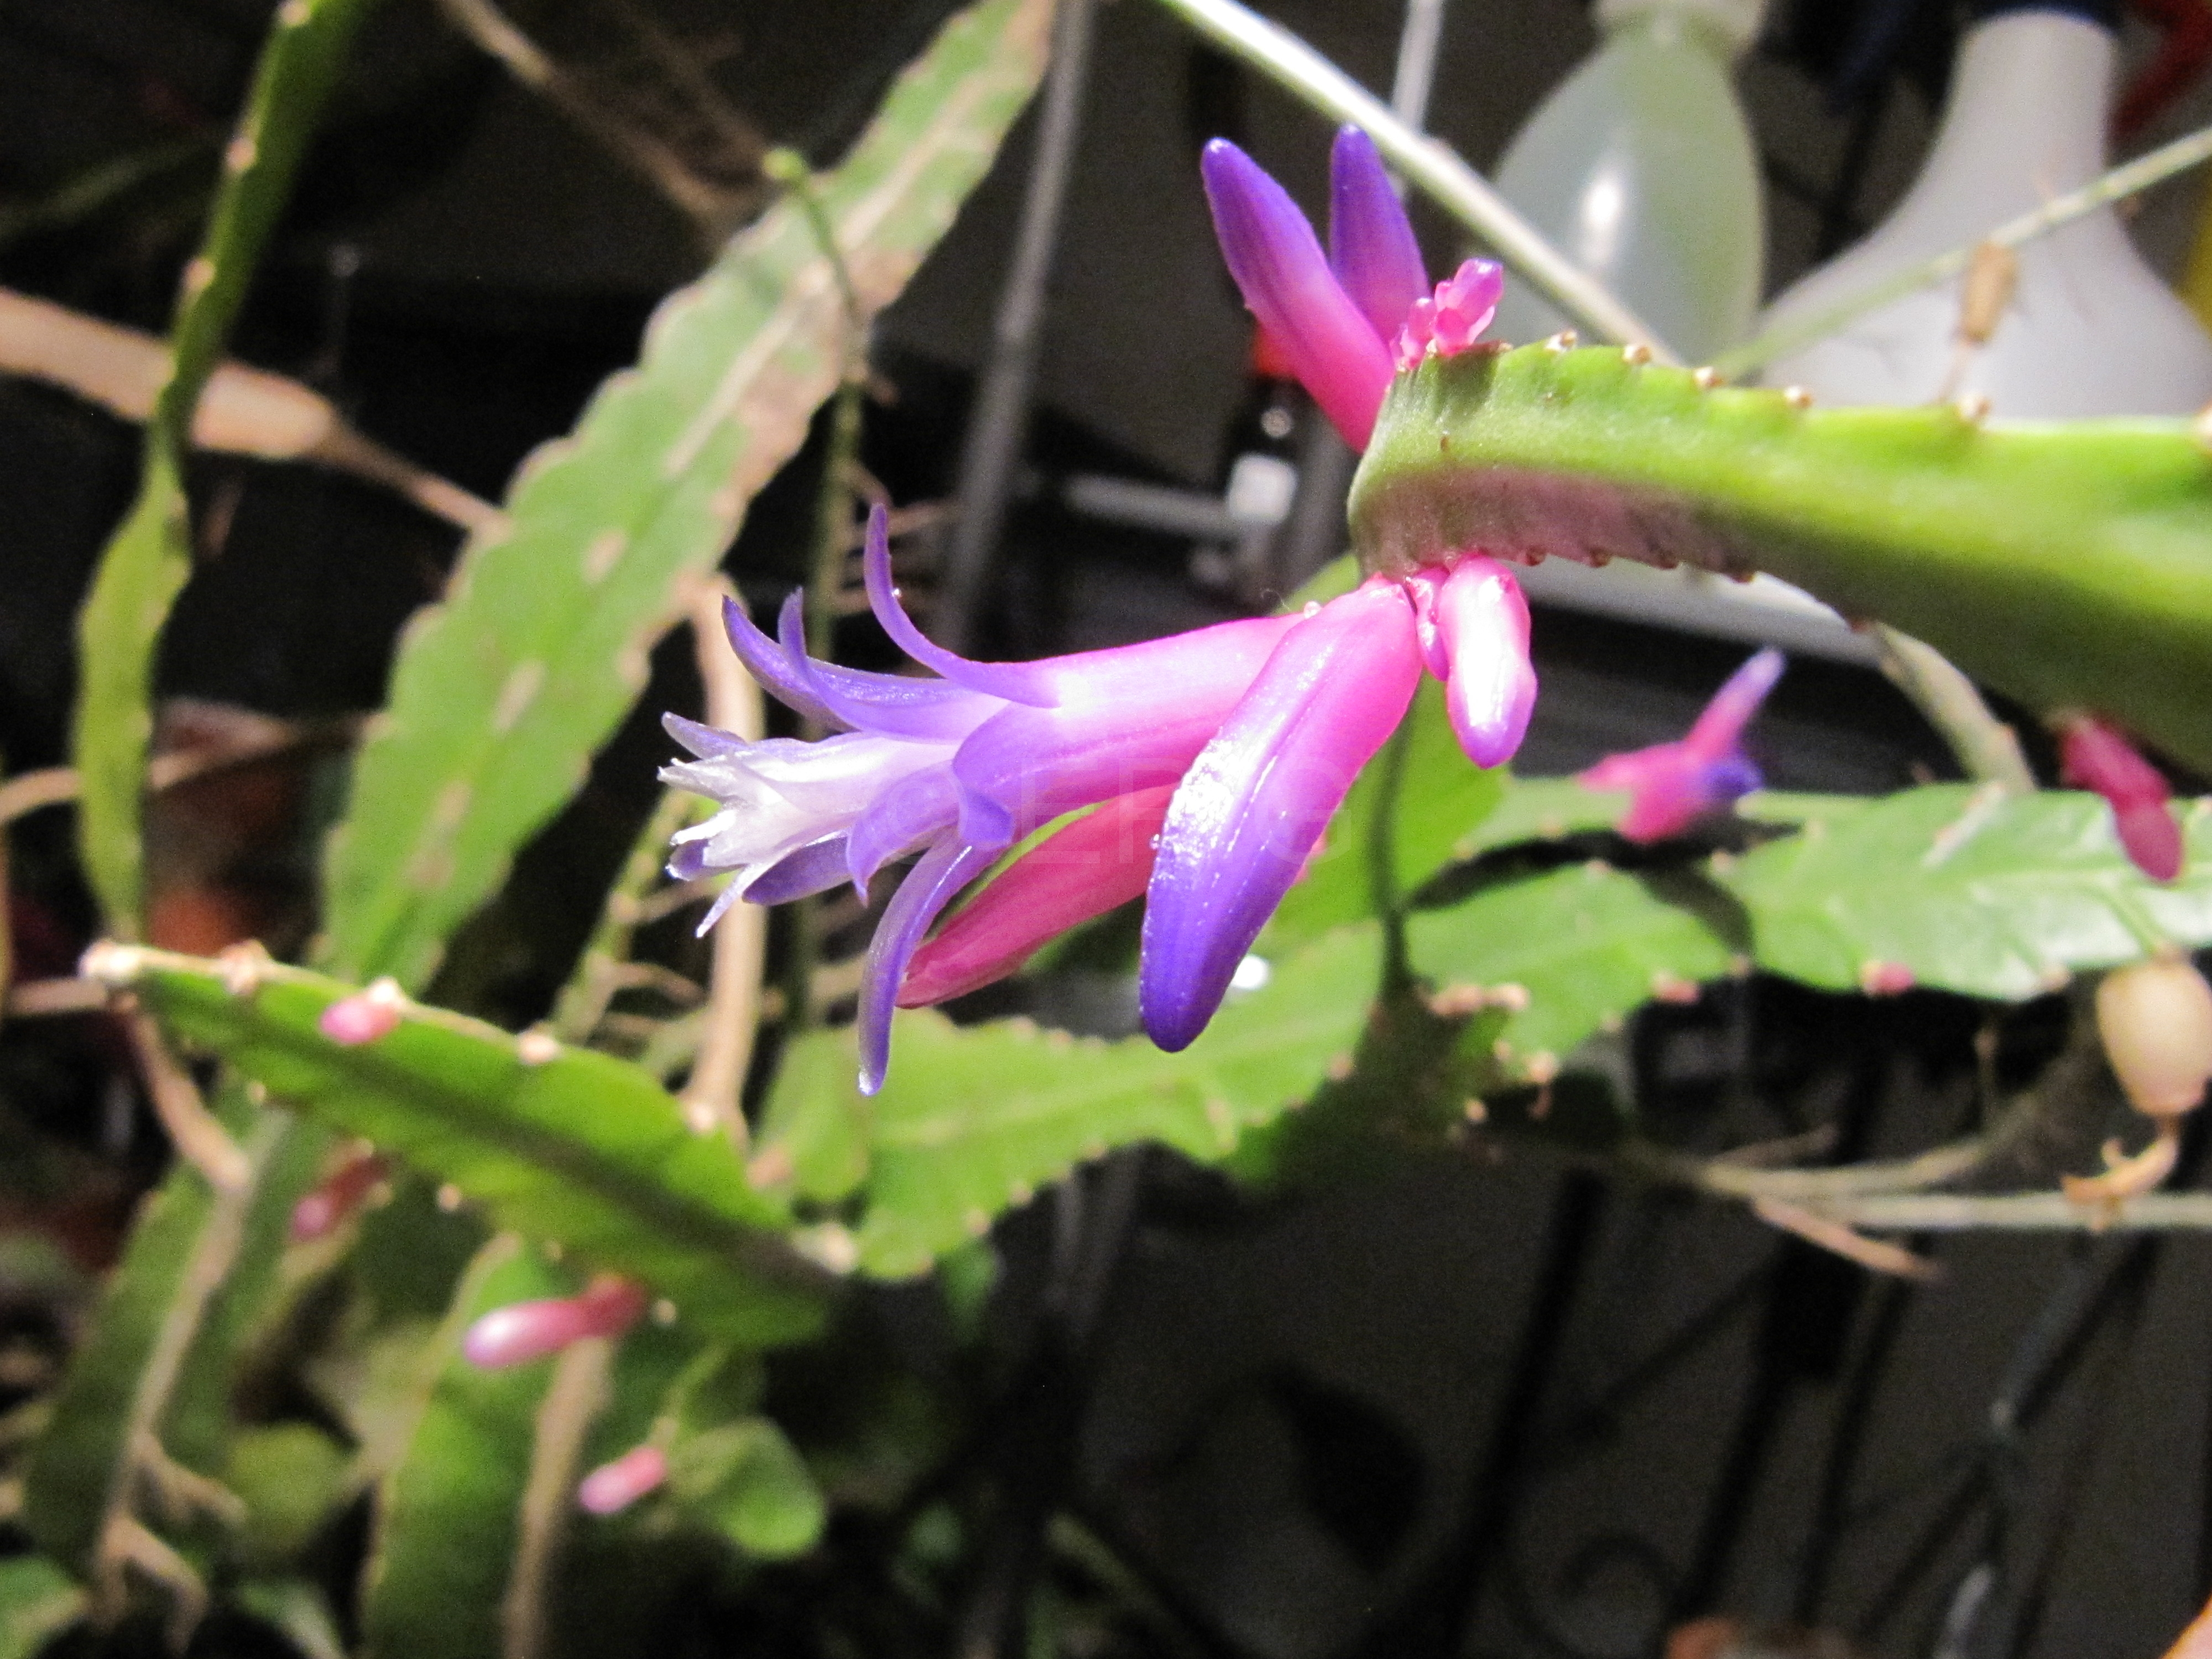 Pseudorhipsalis amazonica ssp. panamensis (Foto Horst Kündiger)